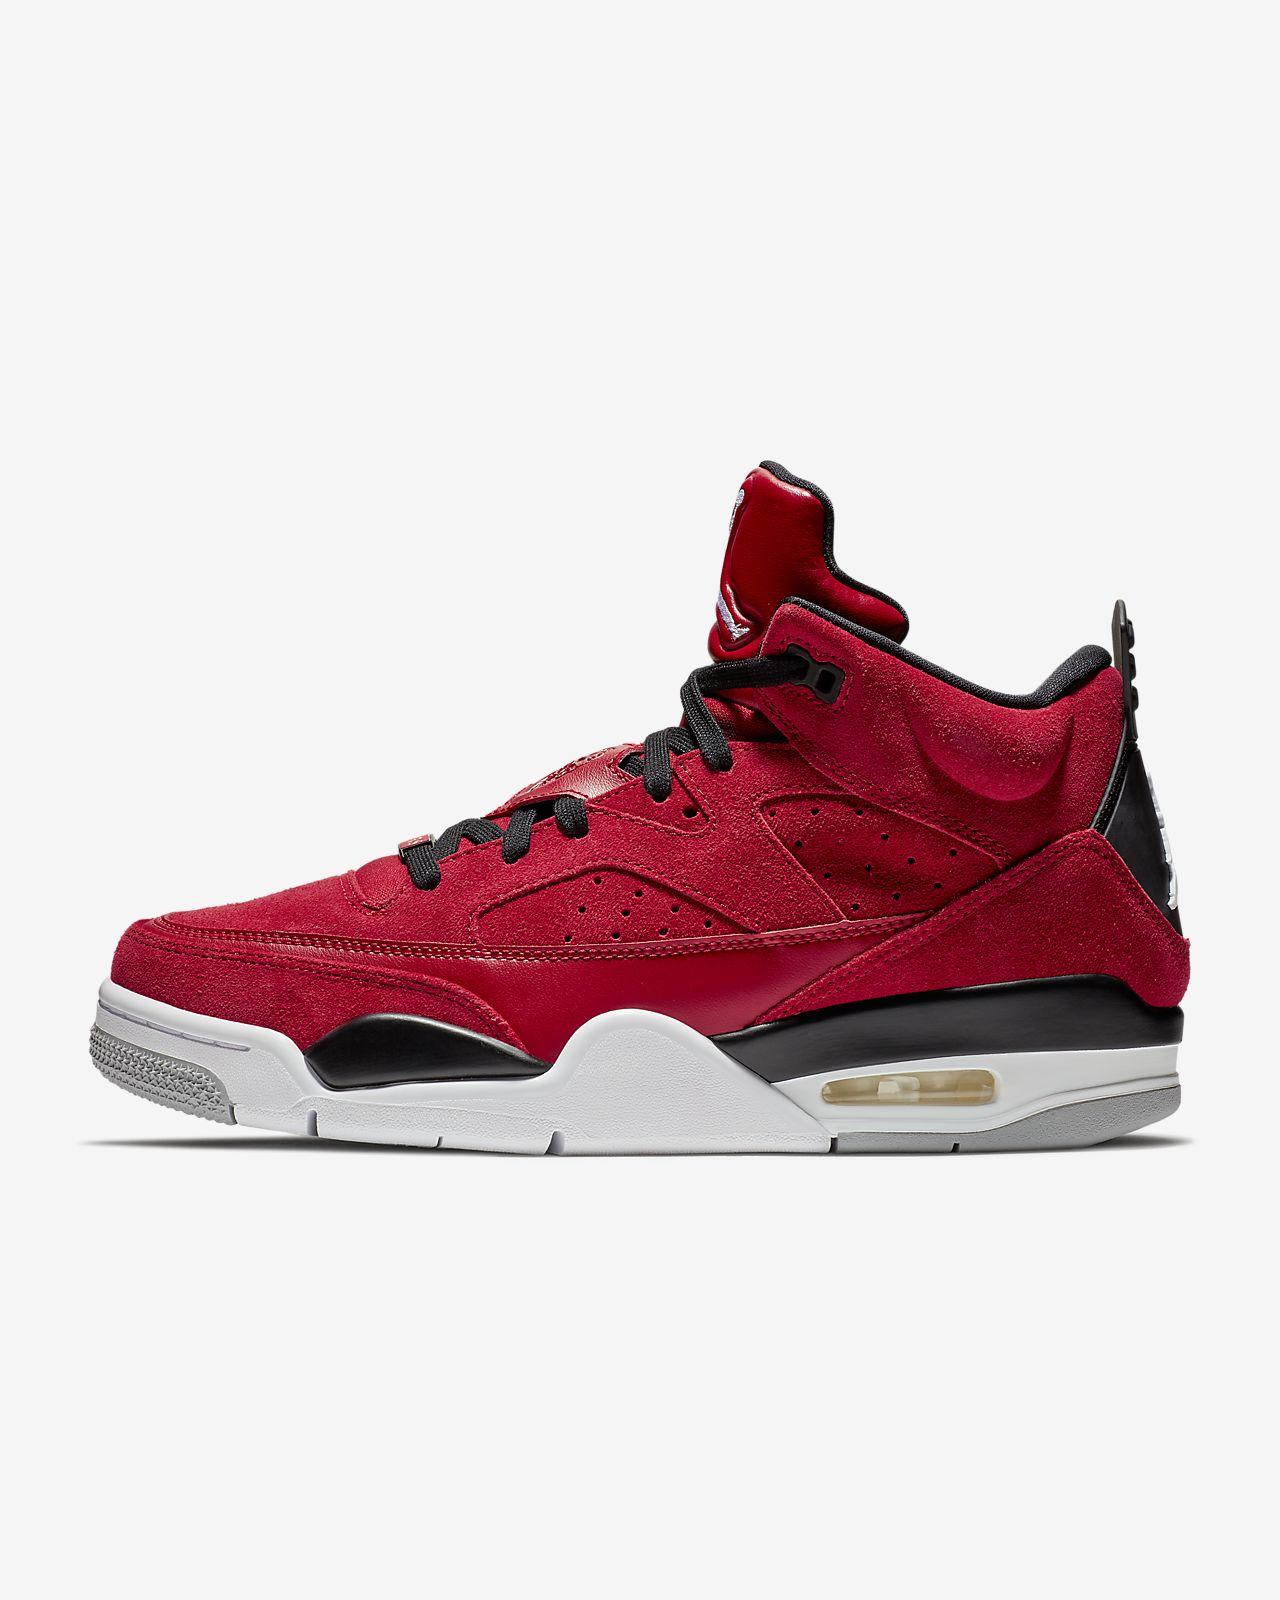 b667aa641a57 ... cheapest jordan son of mars low mens shoe 965ba 73814